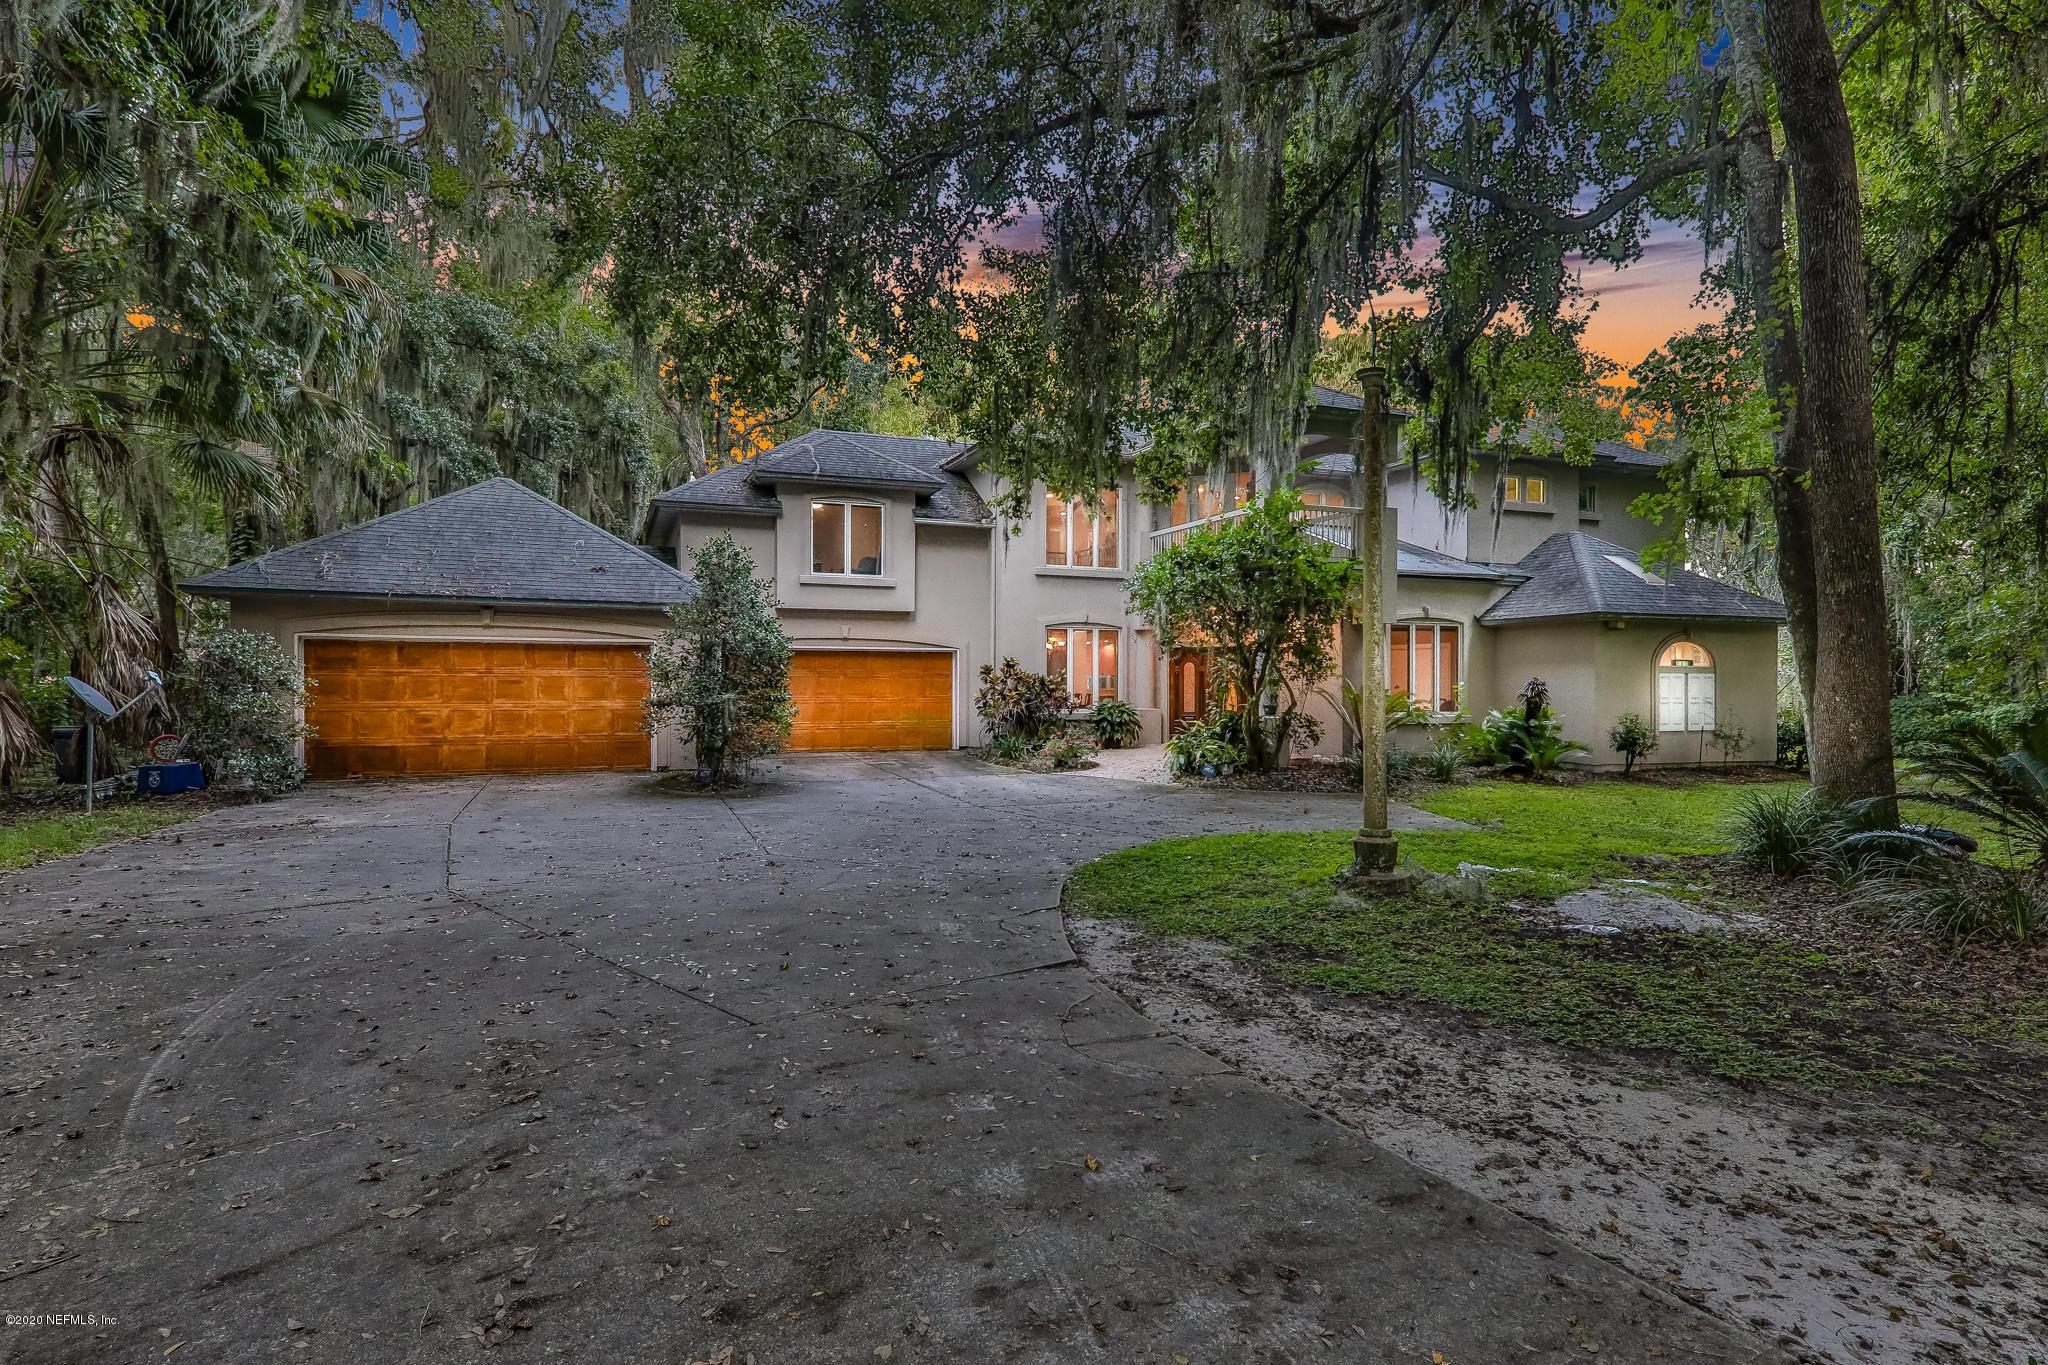 2667 EAGLE BAY, ORANGE PARK, FLORIDA 32073, 4 Bedrooms Bedrooms, ,4 BathroomsBathrooms,Residential,For sale,EAGLE BAY,1039489